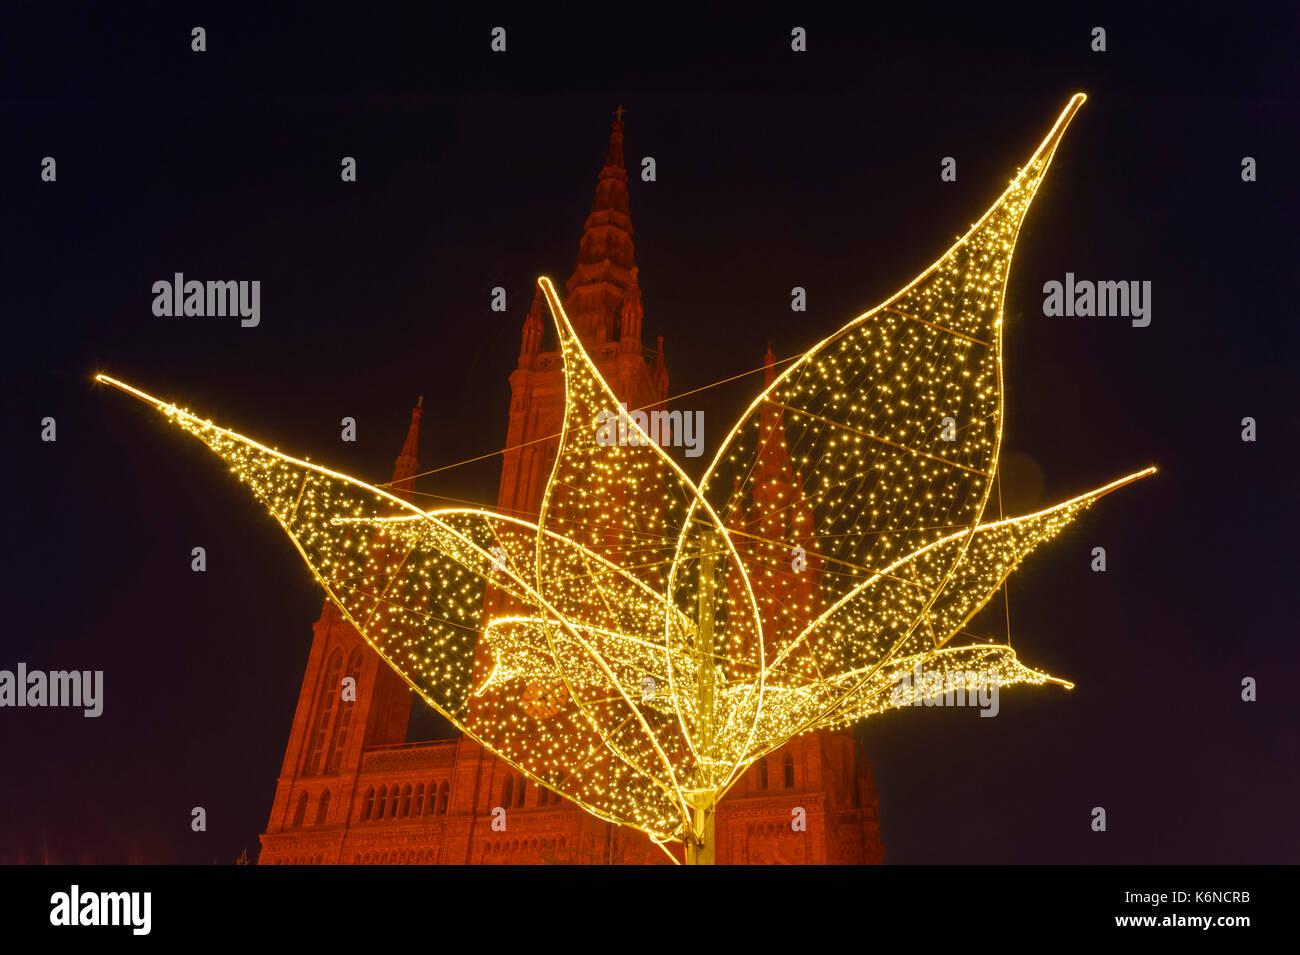 Wiesbaden Christmas Illumination In Front Of Marktkirche At Stock